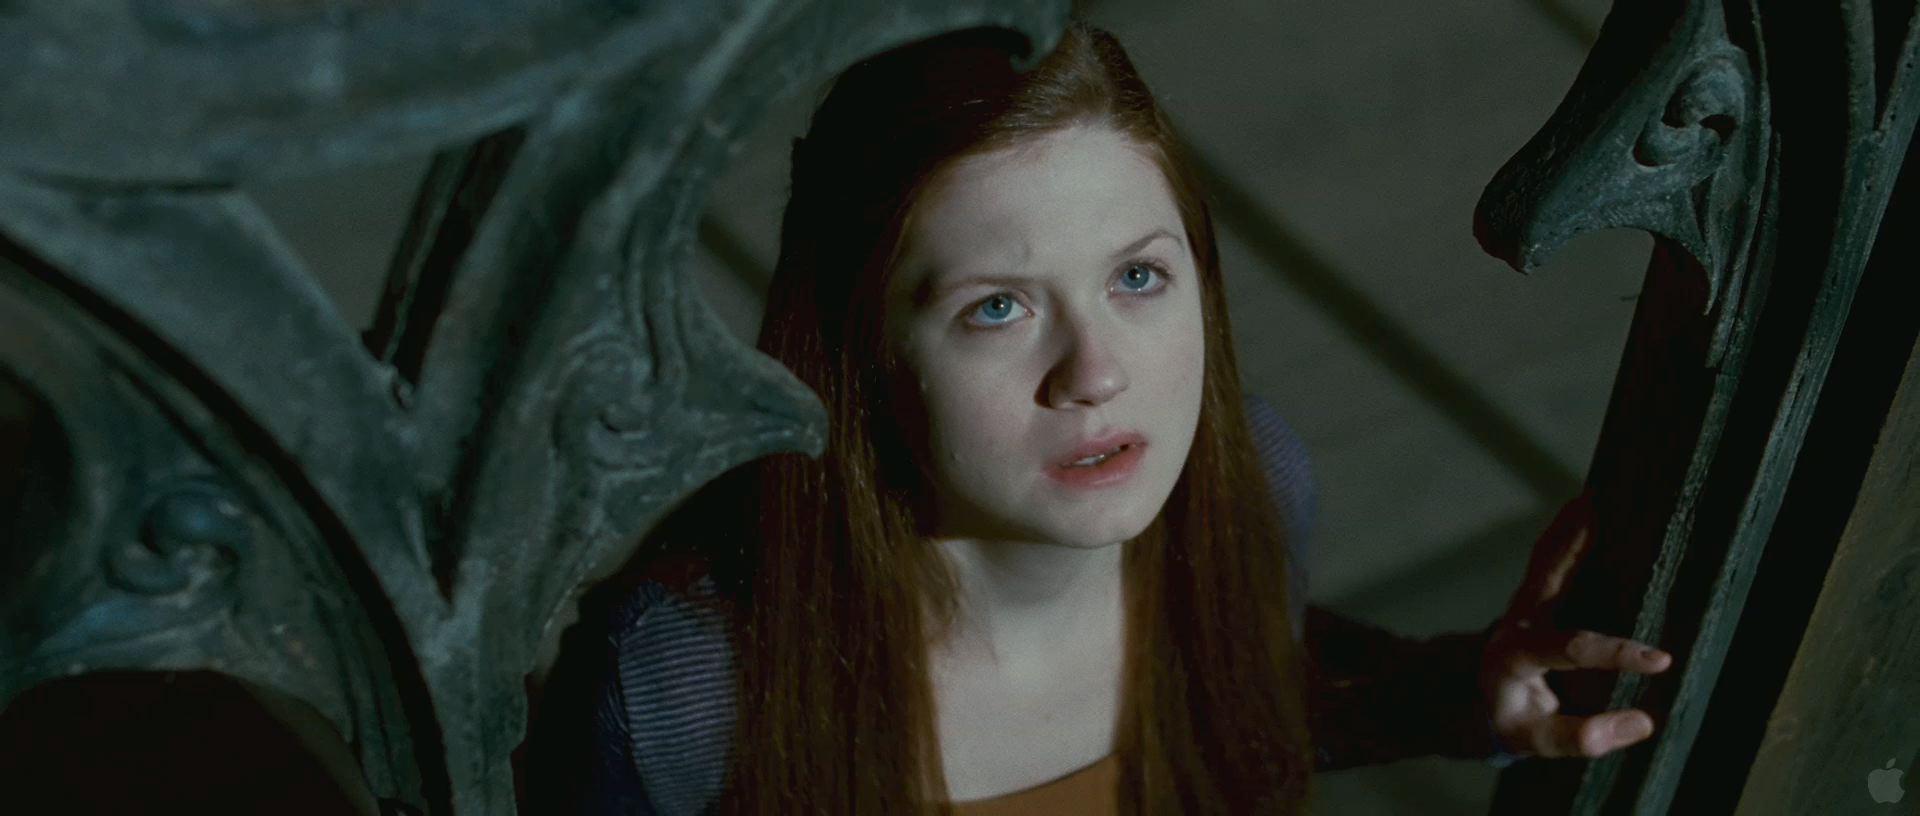 Harry Potter BlogHogwarts HP7 2 Trailer 54